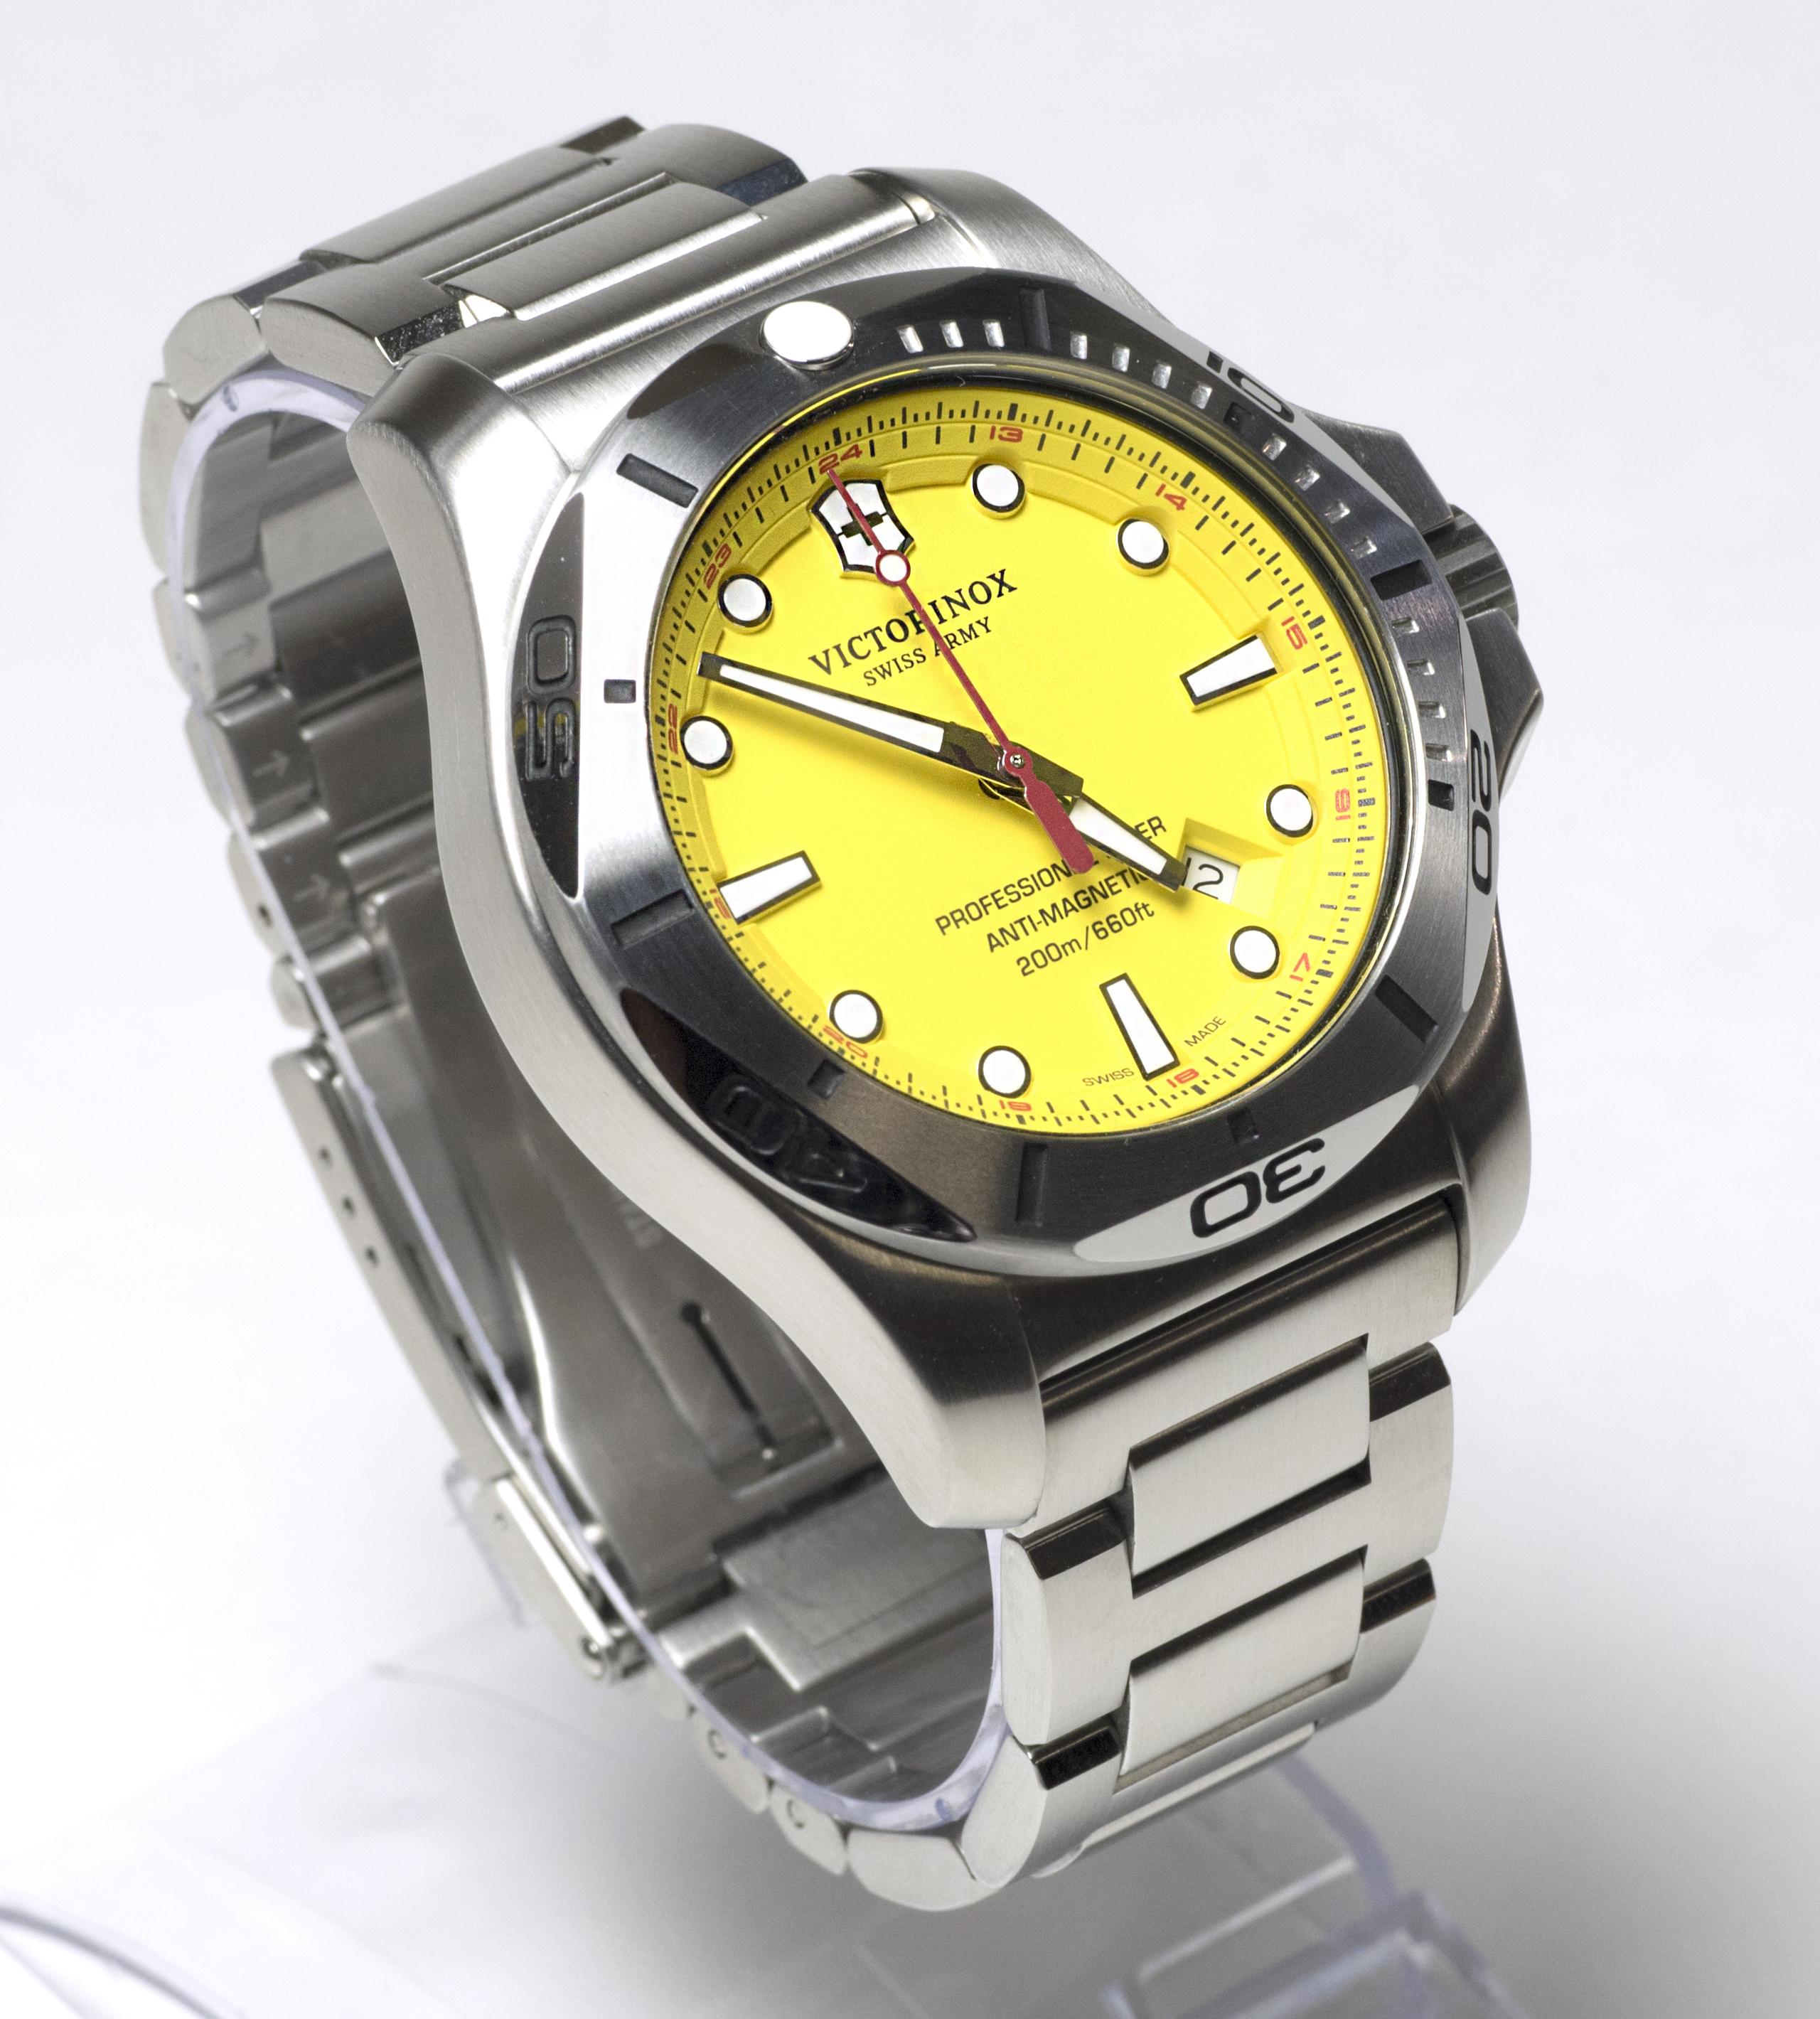 Victorinox Swiss Army I N O X Professional Dive Watch